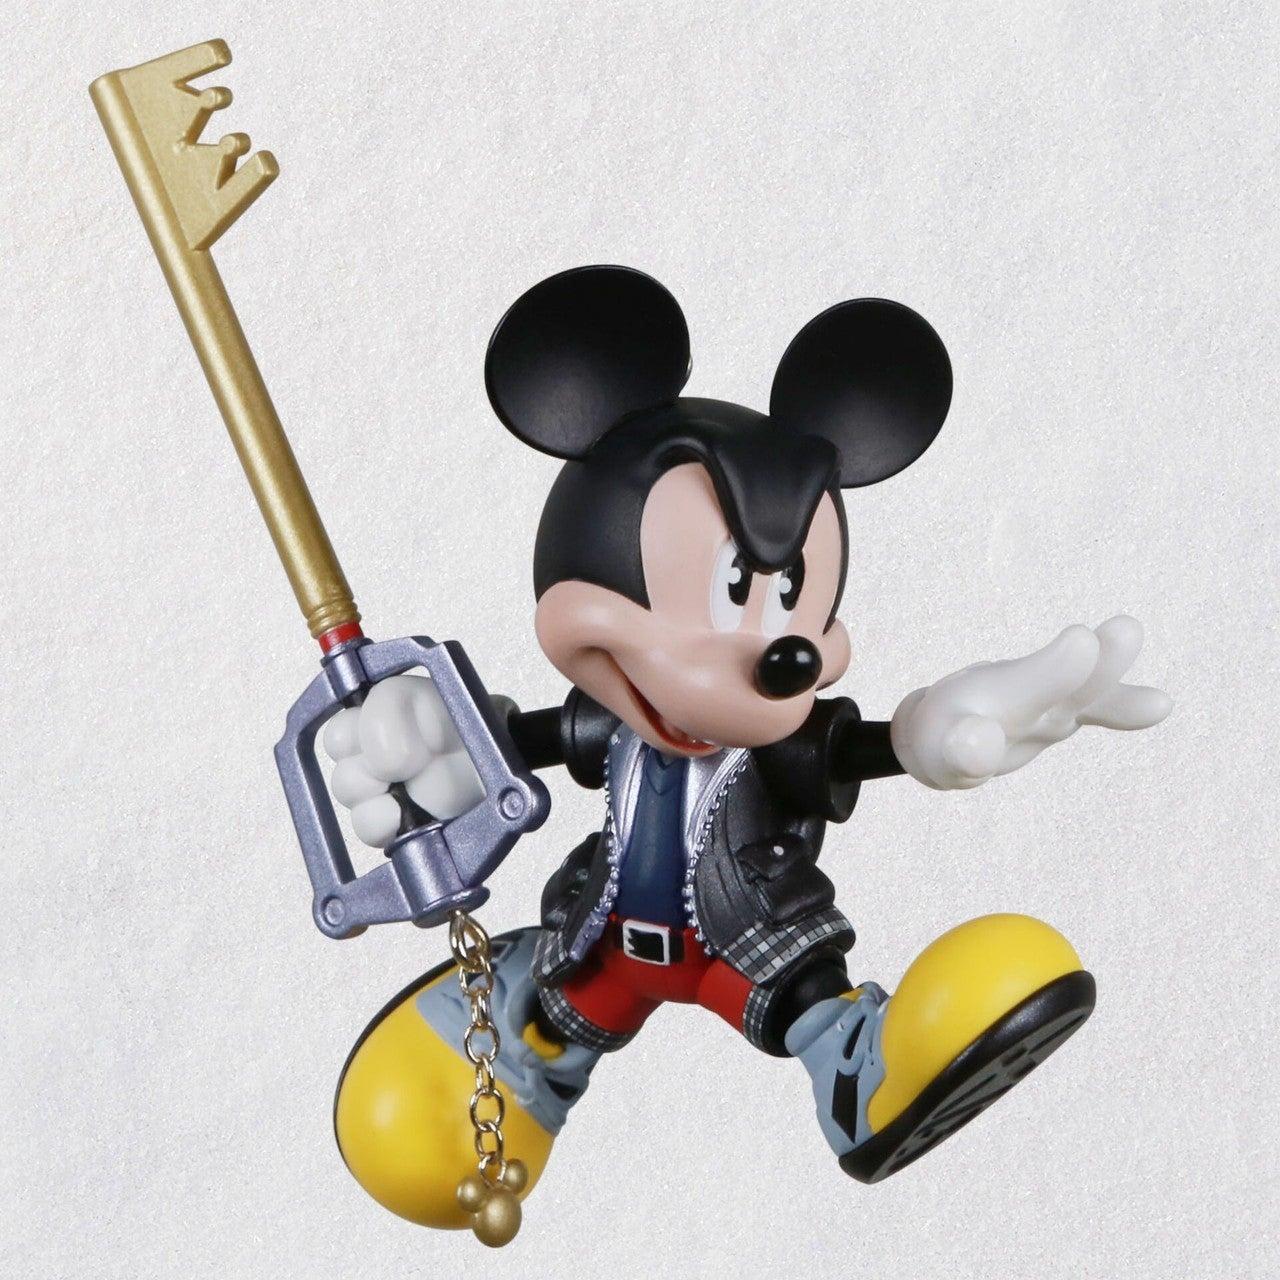 Disney-Kingdom-Hearts-King-Mickey-Keepsake-Ornament_1799QXD6535_01